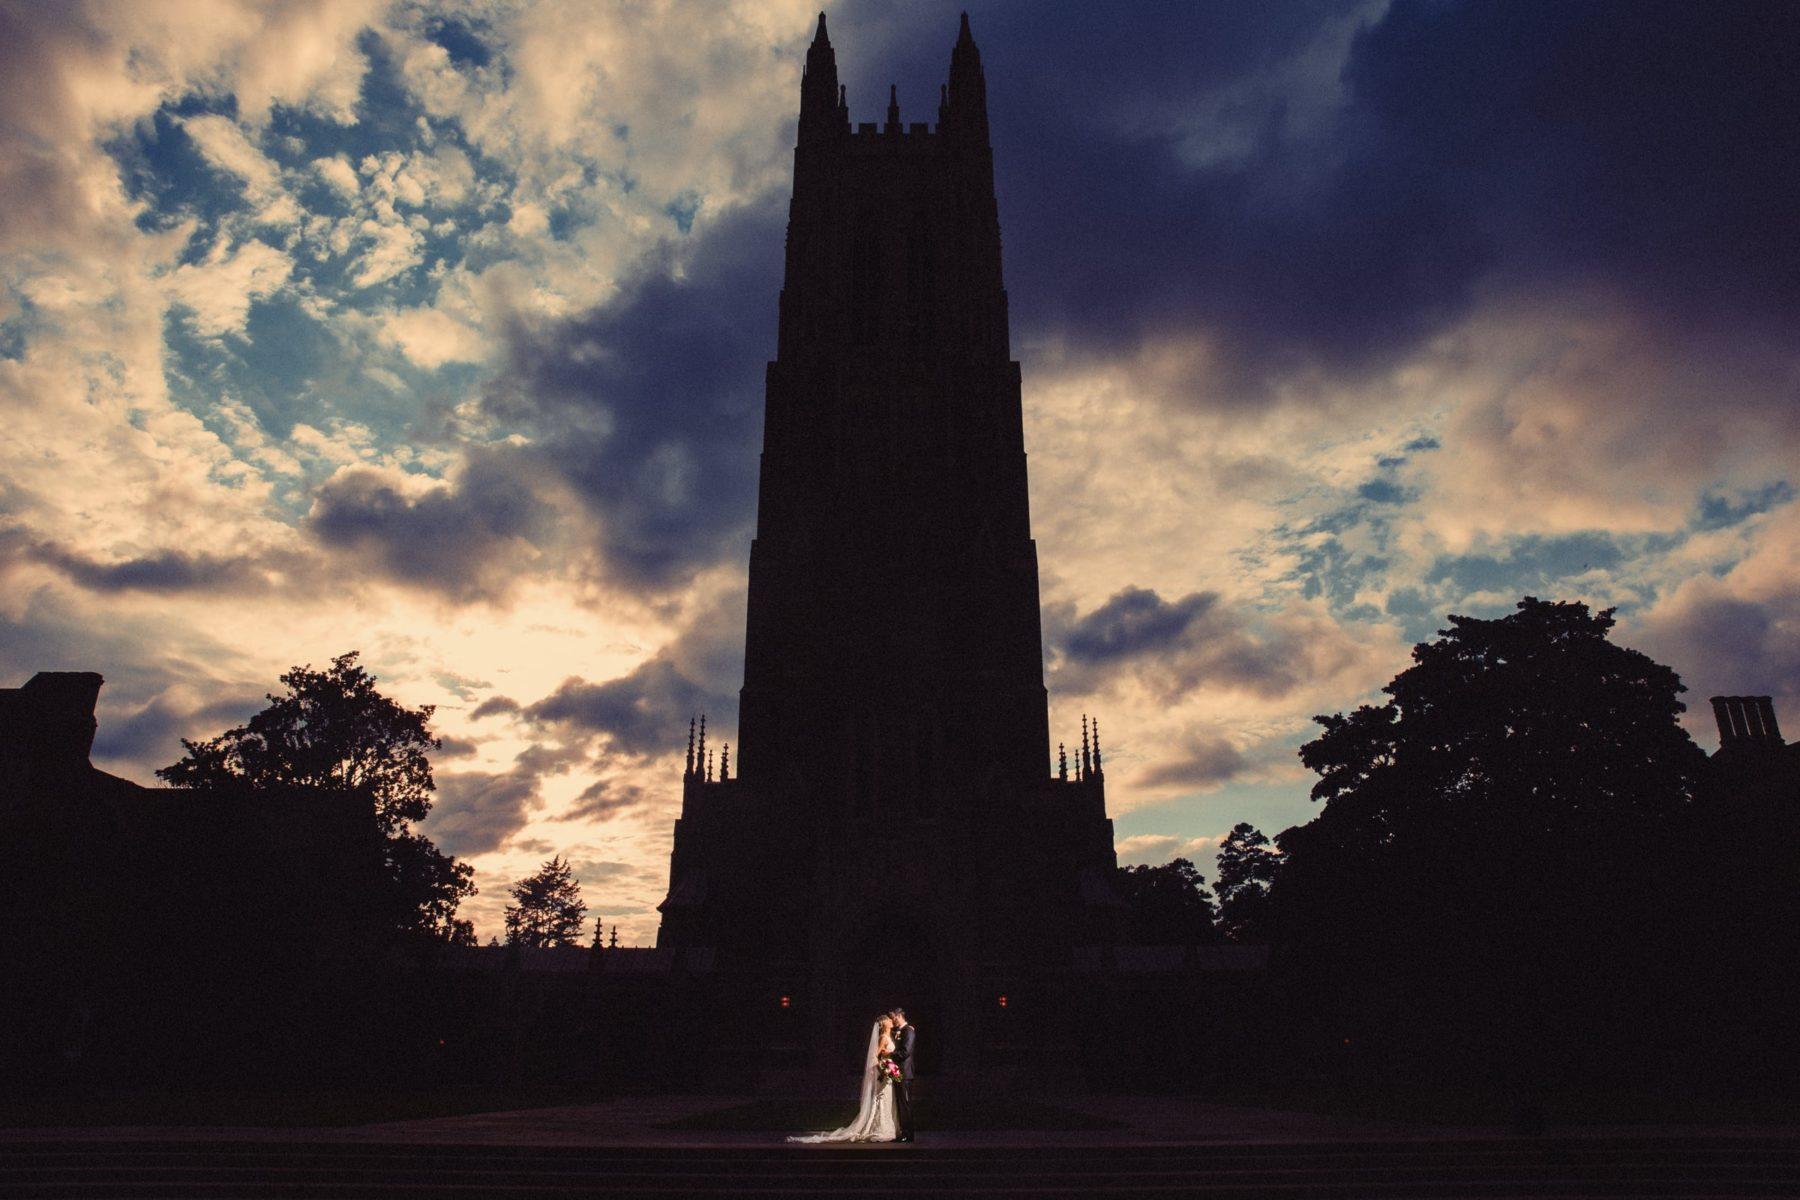 Duke Chapel Silhouette w- brige and groom-1